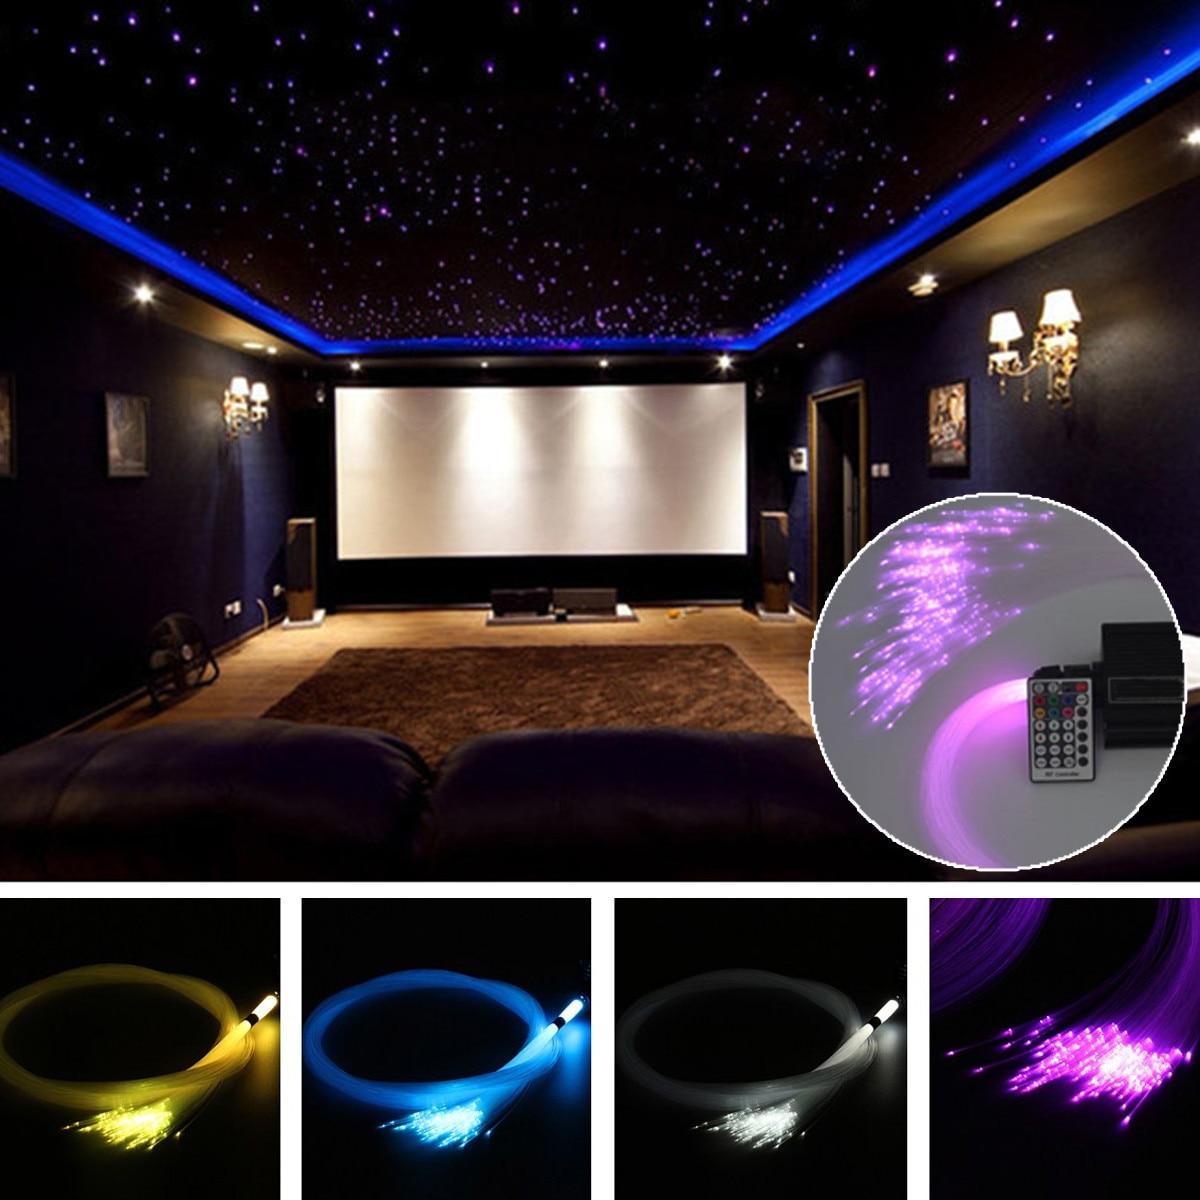 150Pcs 0.75mm x 2m RGB Fiber Optic Lights DIY LED Strips ...